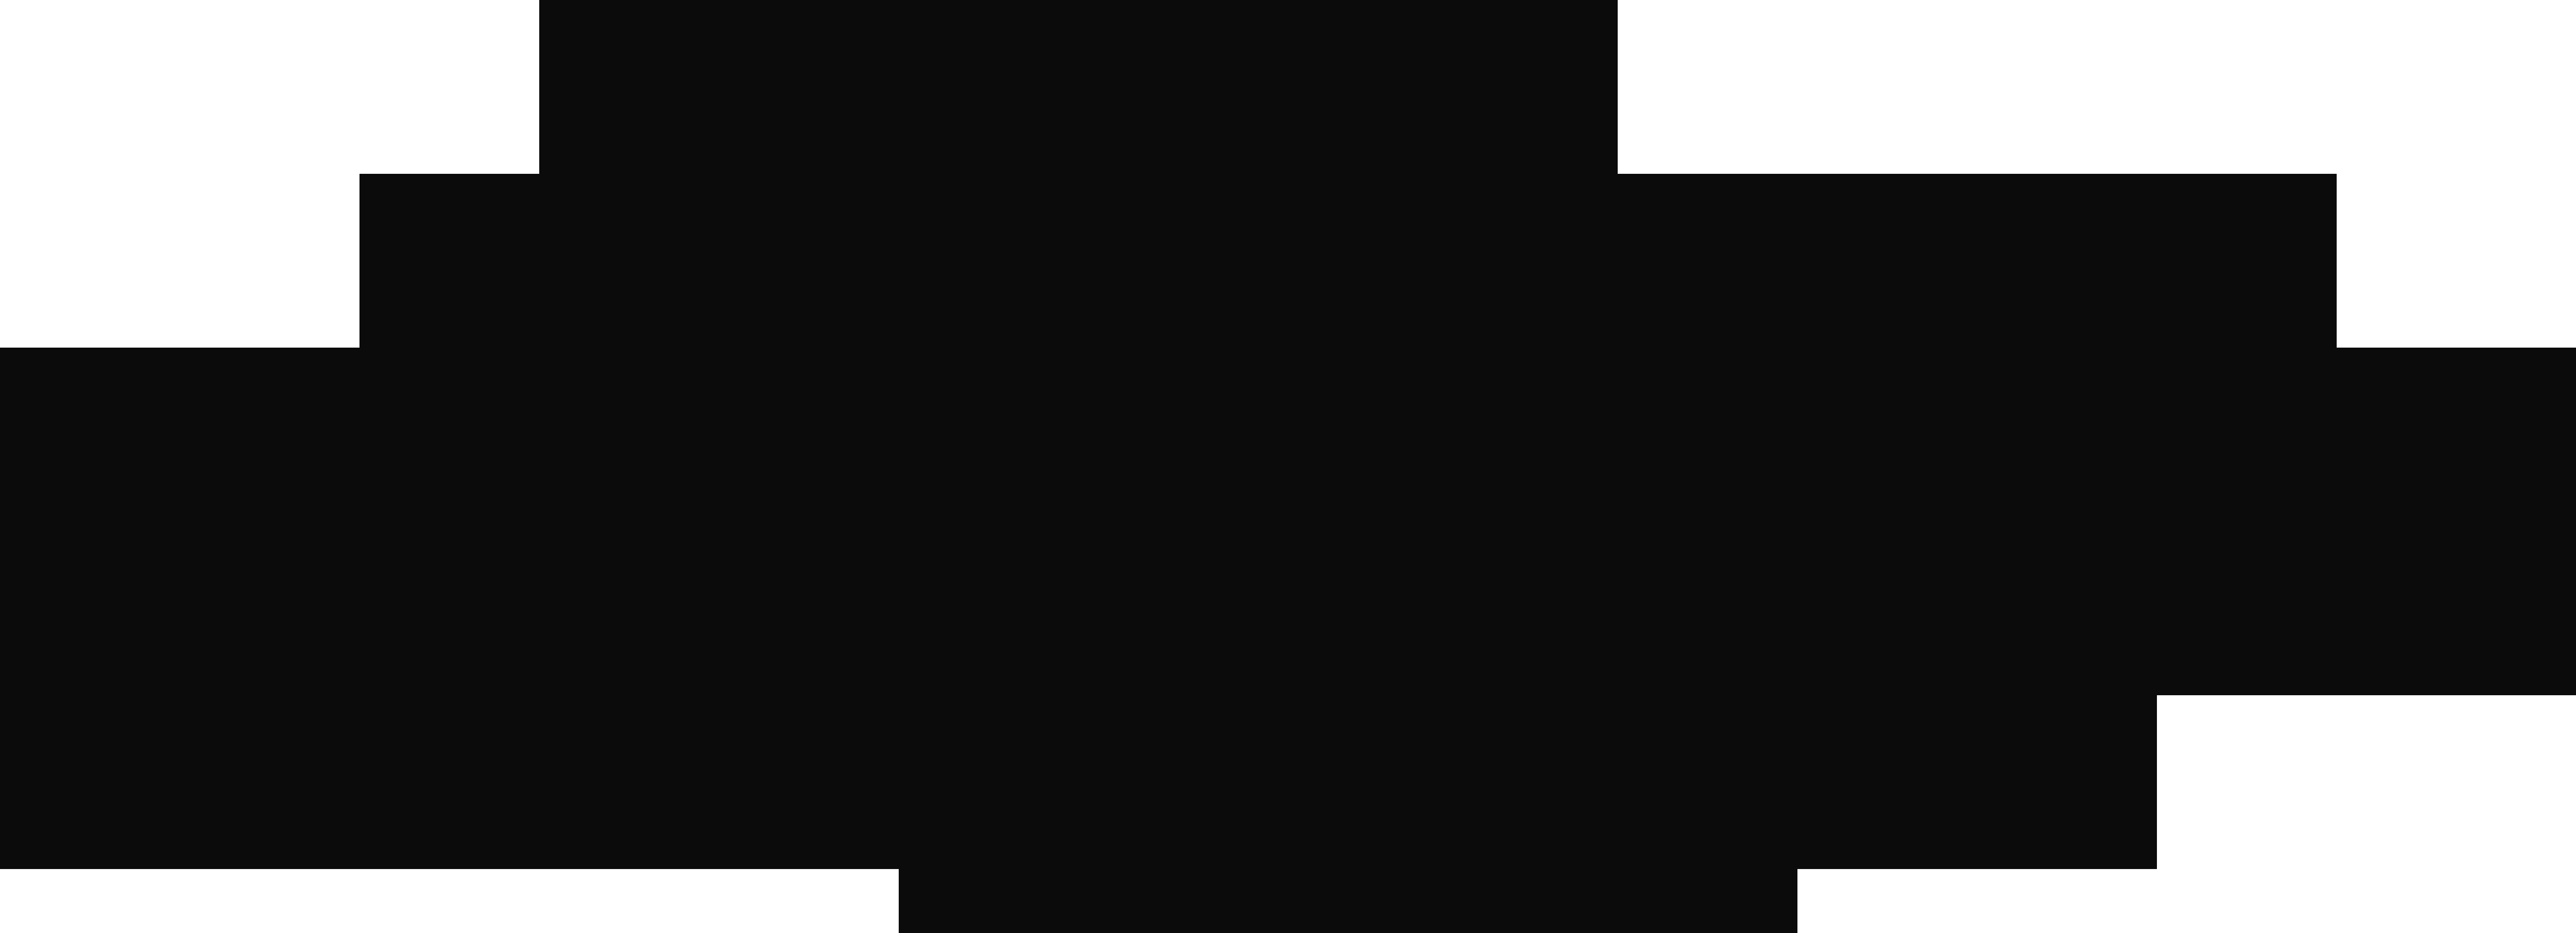 CLI_Texture_GrayLight